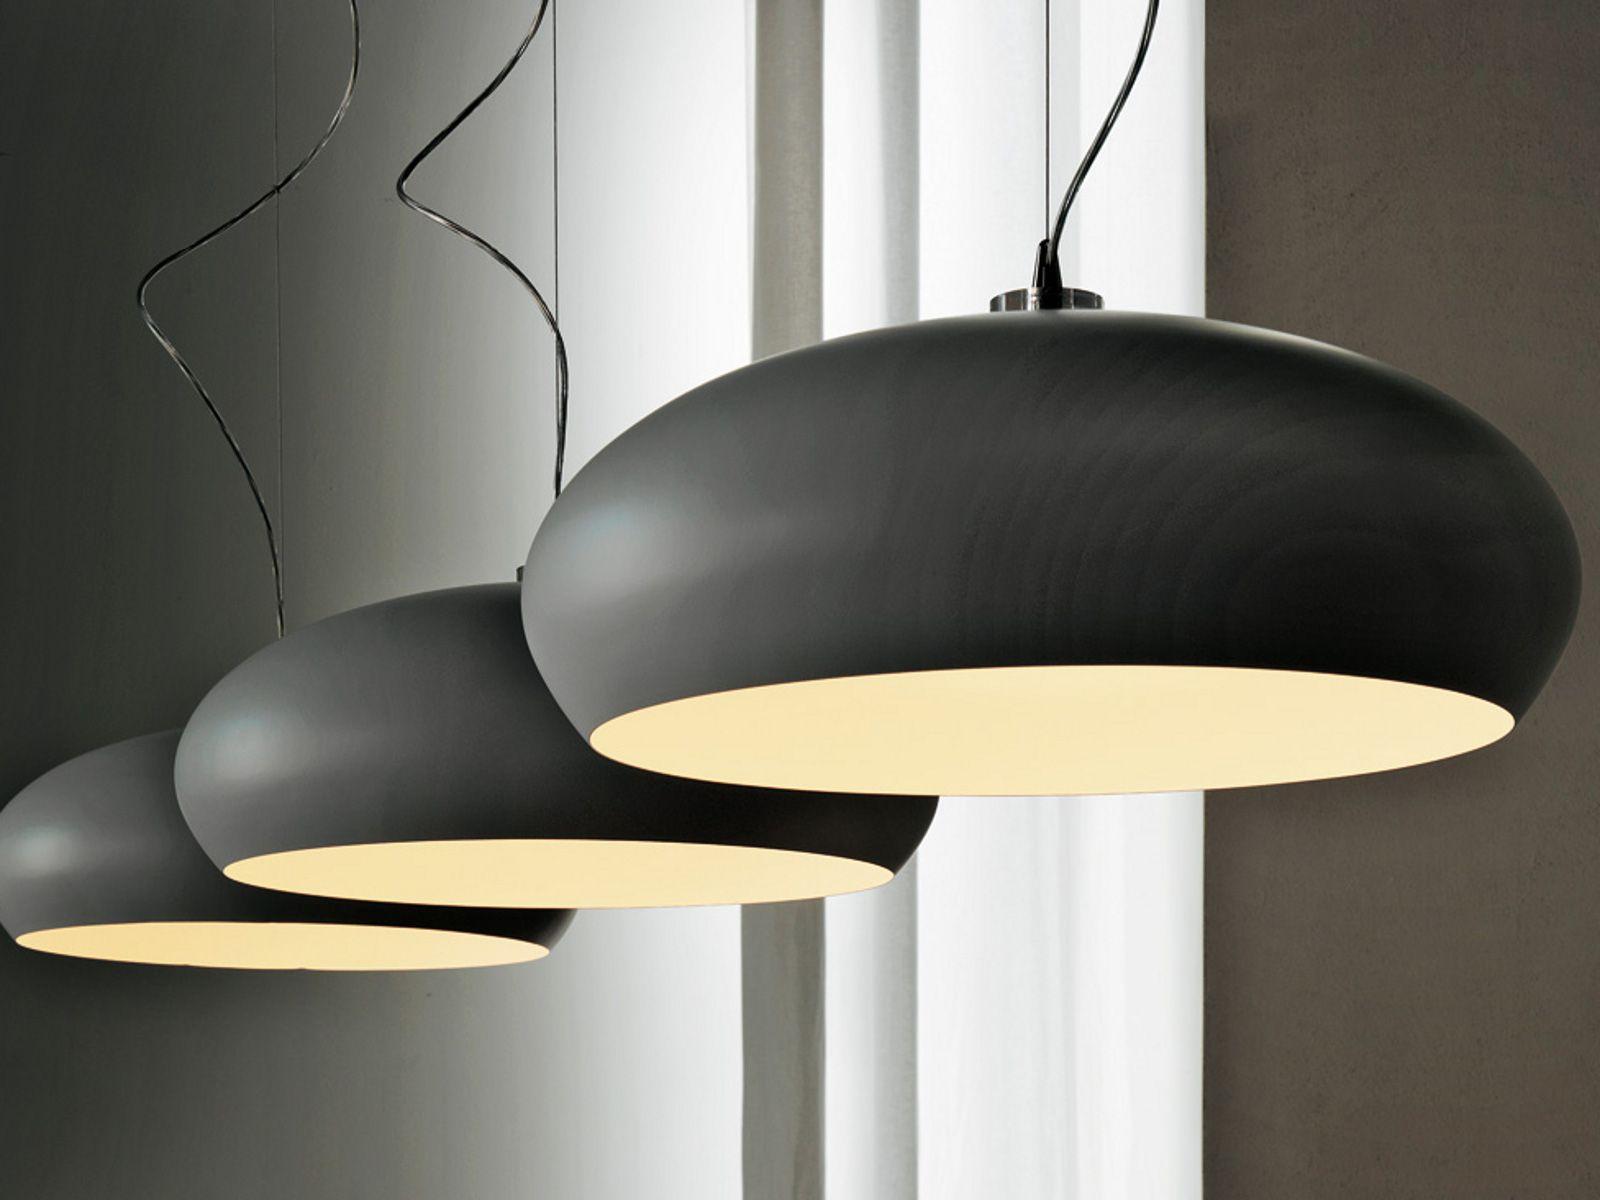 Plafoniere Smart : Suspension en acier hublot by cattelan italia design smart studio